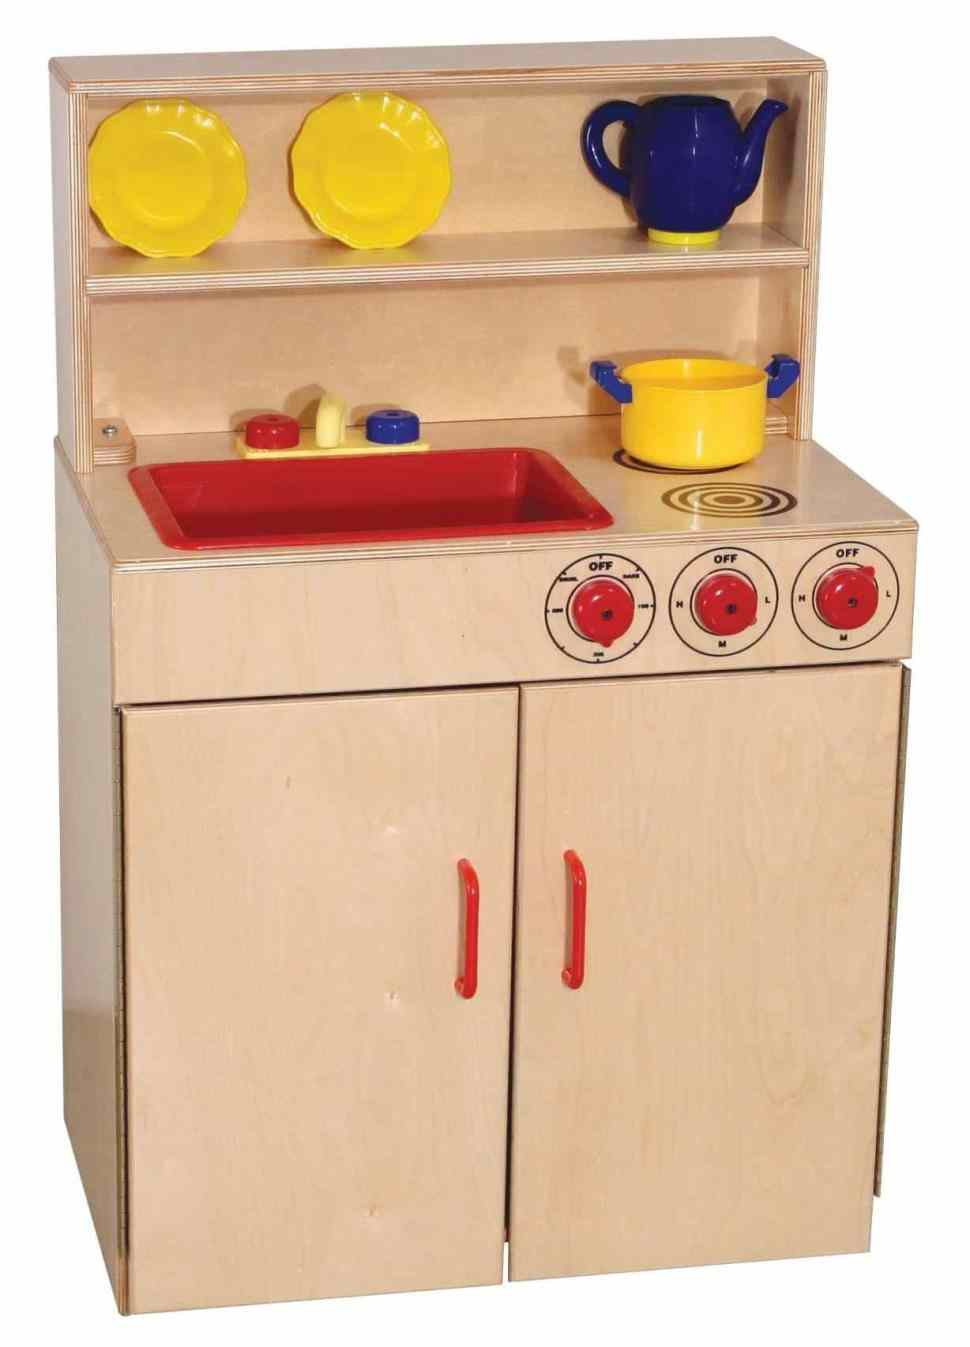 Clipart kitchen preschool. Play cliparts x making